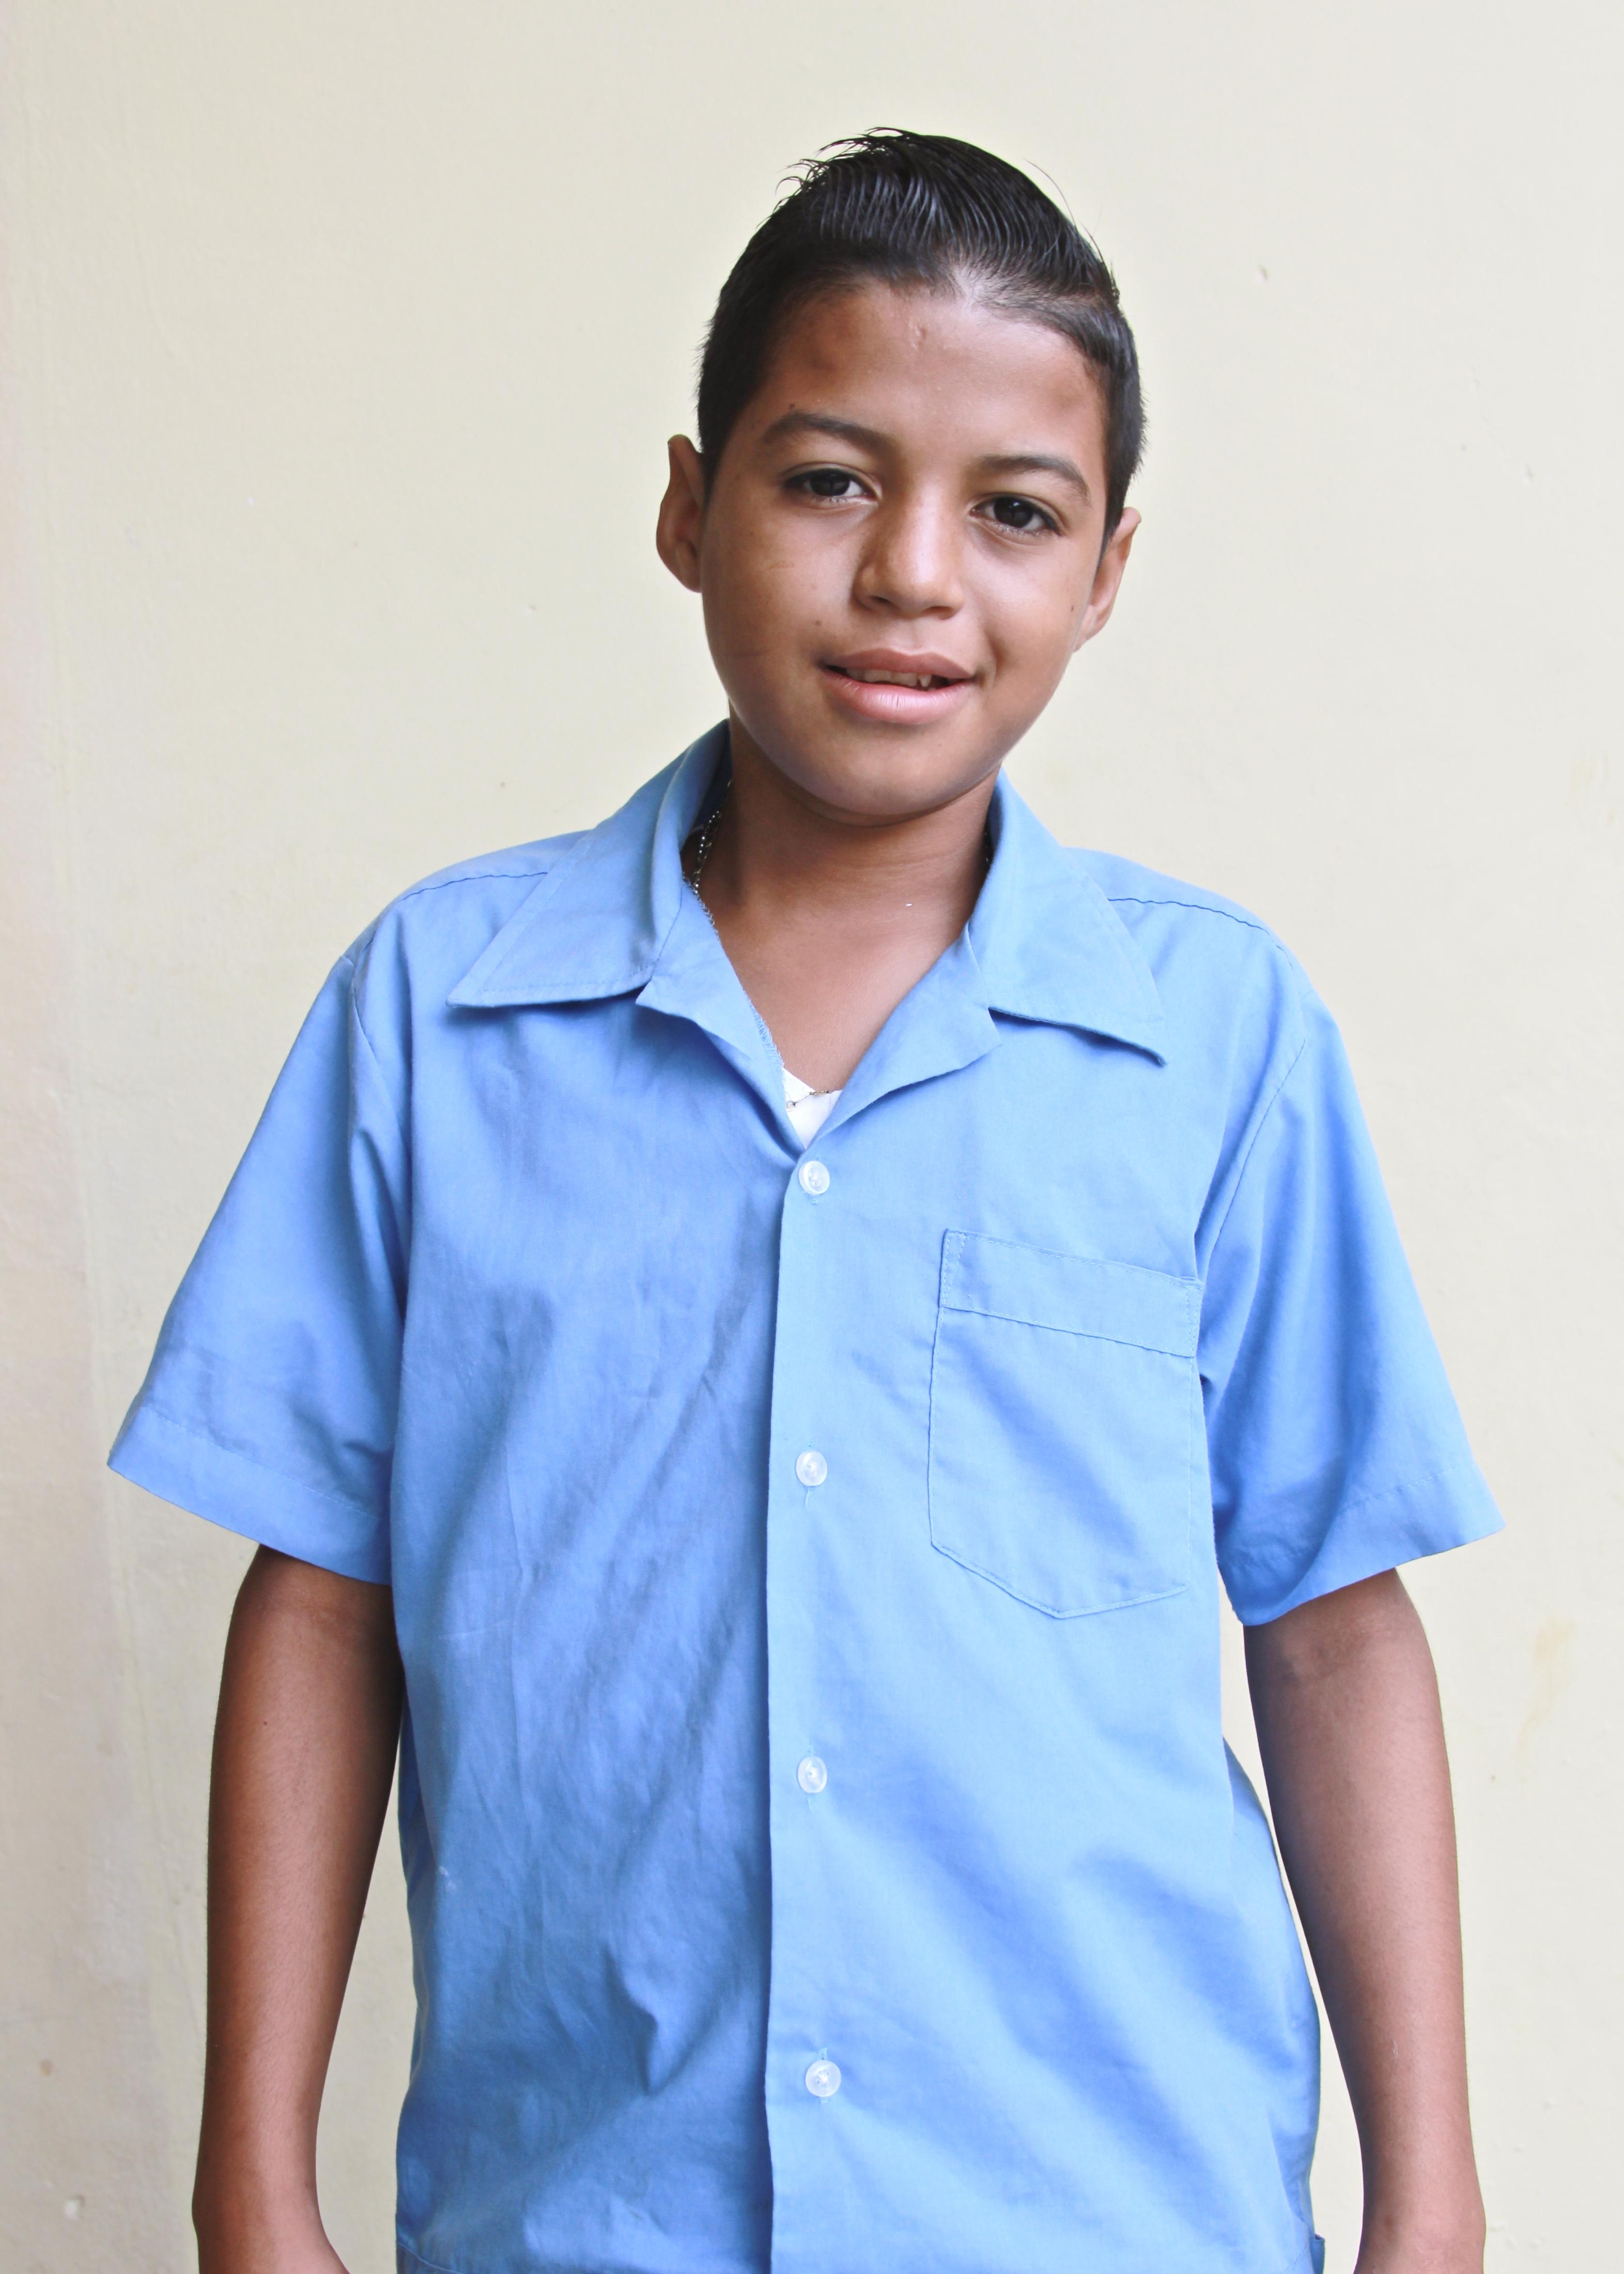 Estudiantes de Honduras: Meet Jose M., 6th Grader at the Villa Soleada Bilingual School